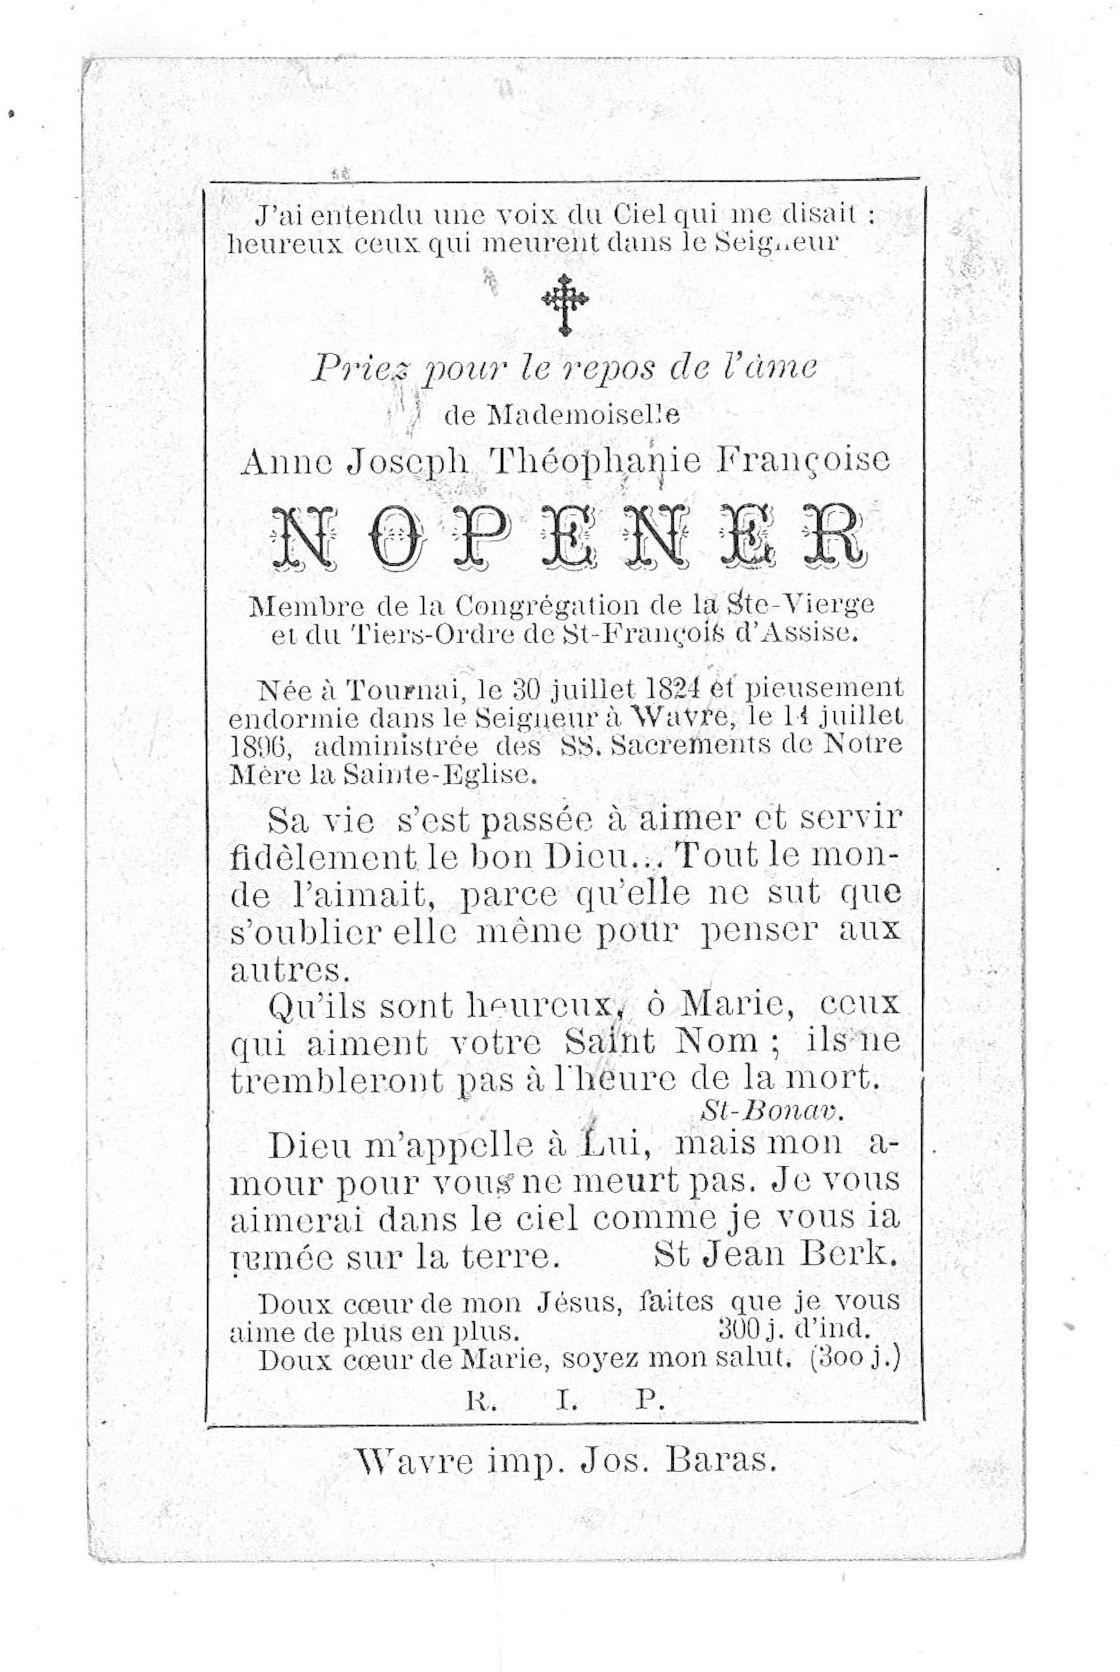 Anne Joseph Théophanie Françoise Nopener